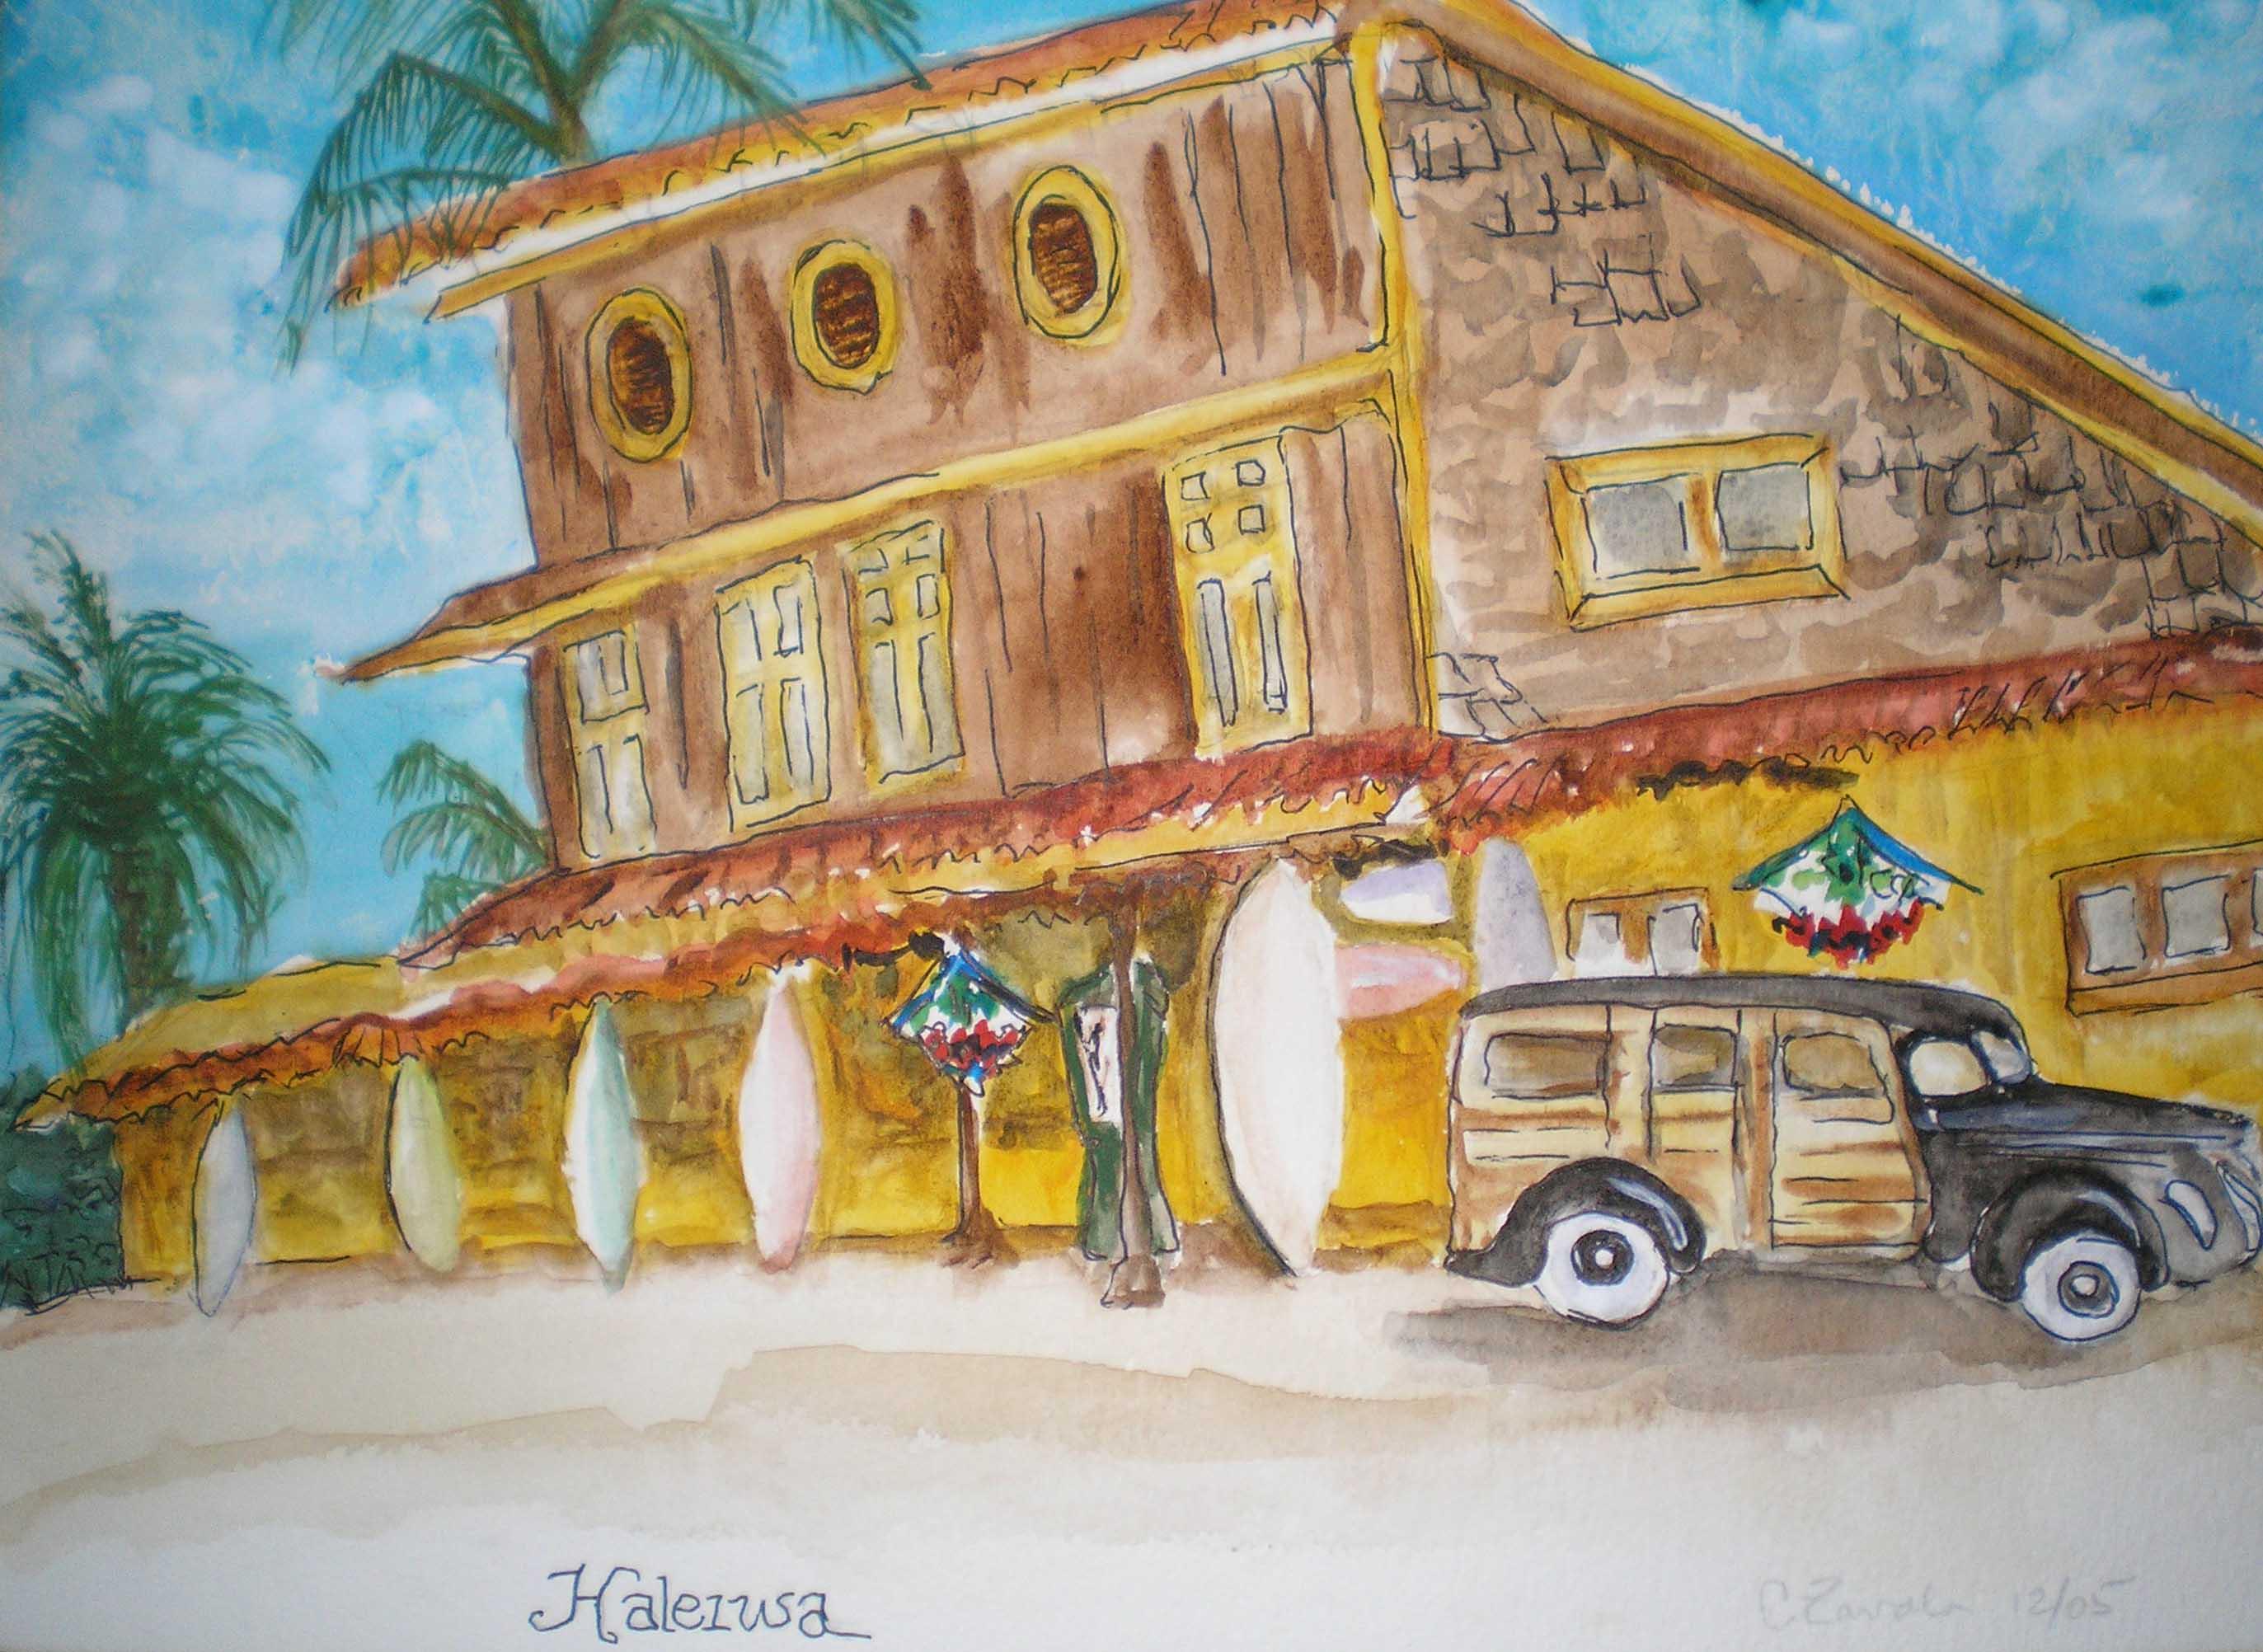 Haleiwa Surf Shop